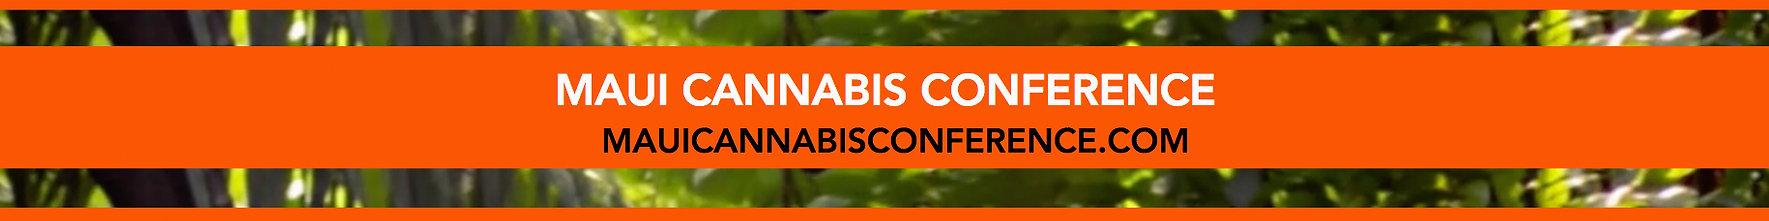 mauicannabisconference.jpg